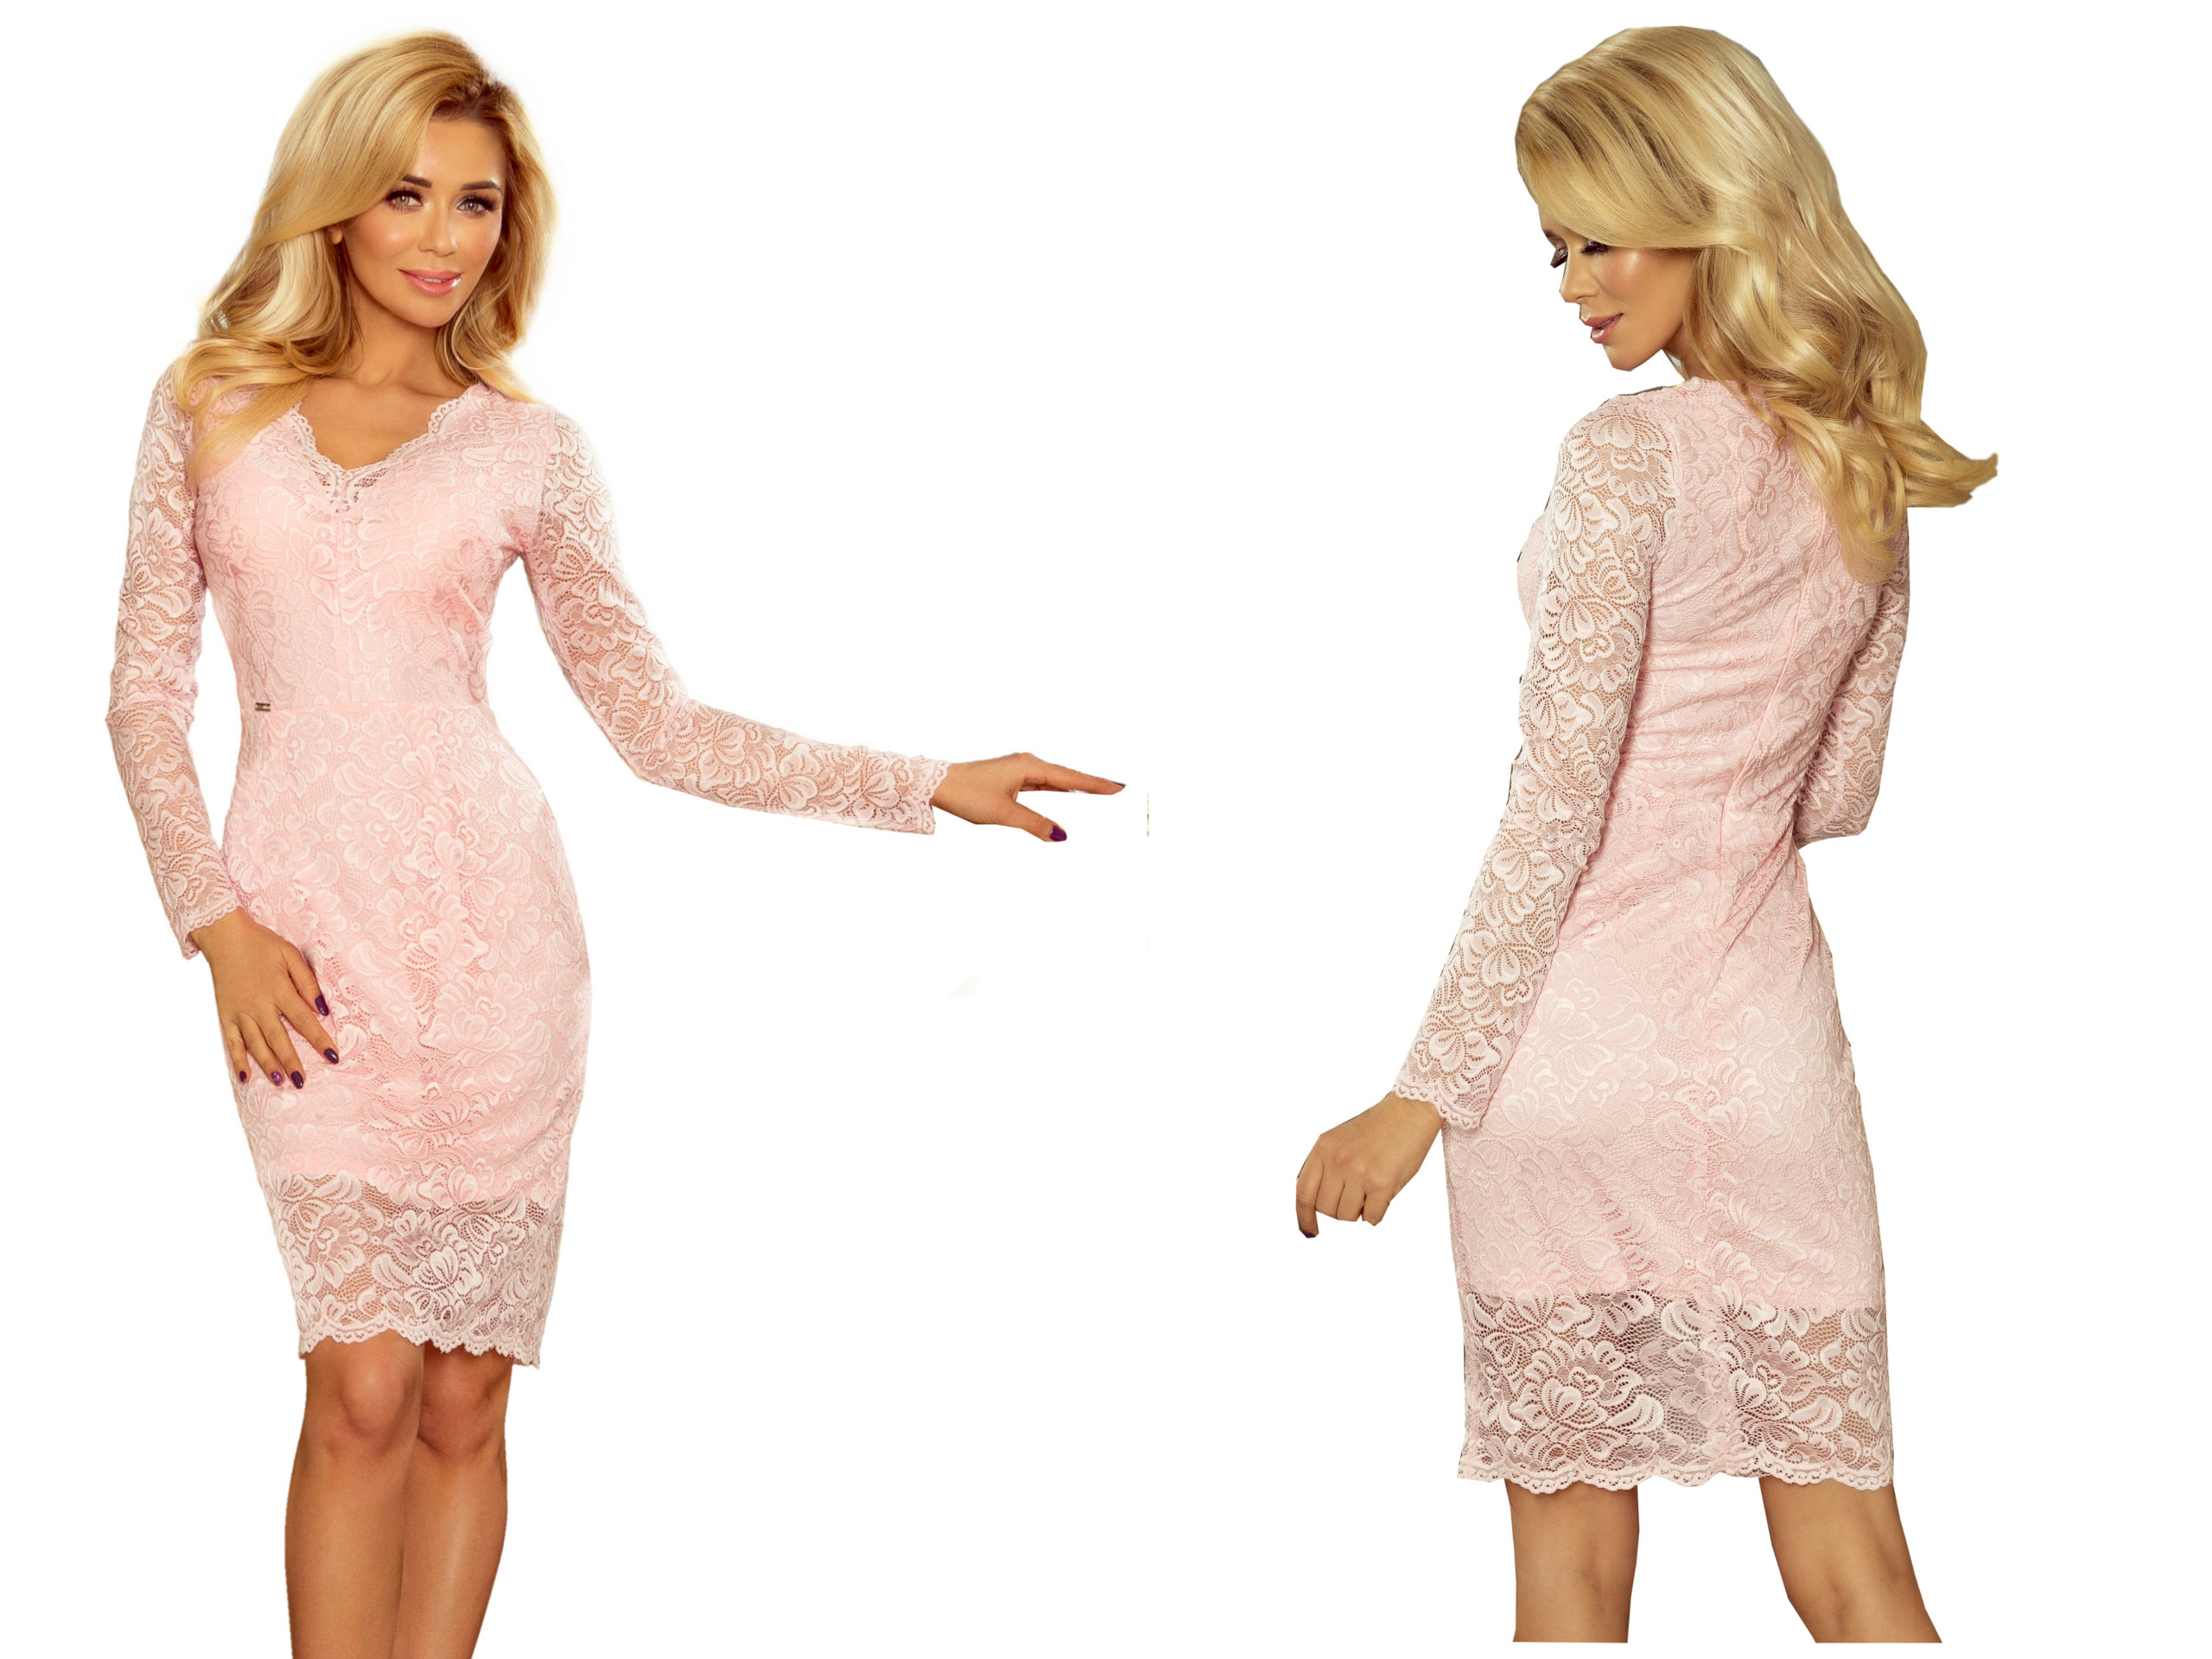 77d673c68c Sukienka NA WESELE Weselna KORONKOWA 170-4 L 40 7561535455 - Allegro.pl